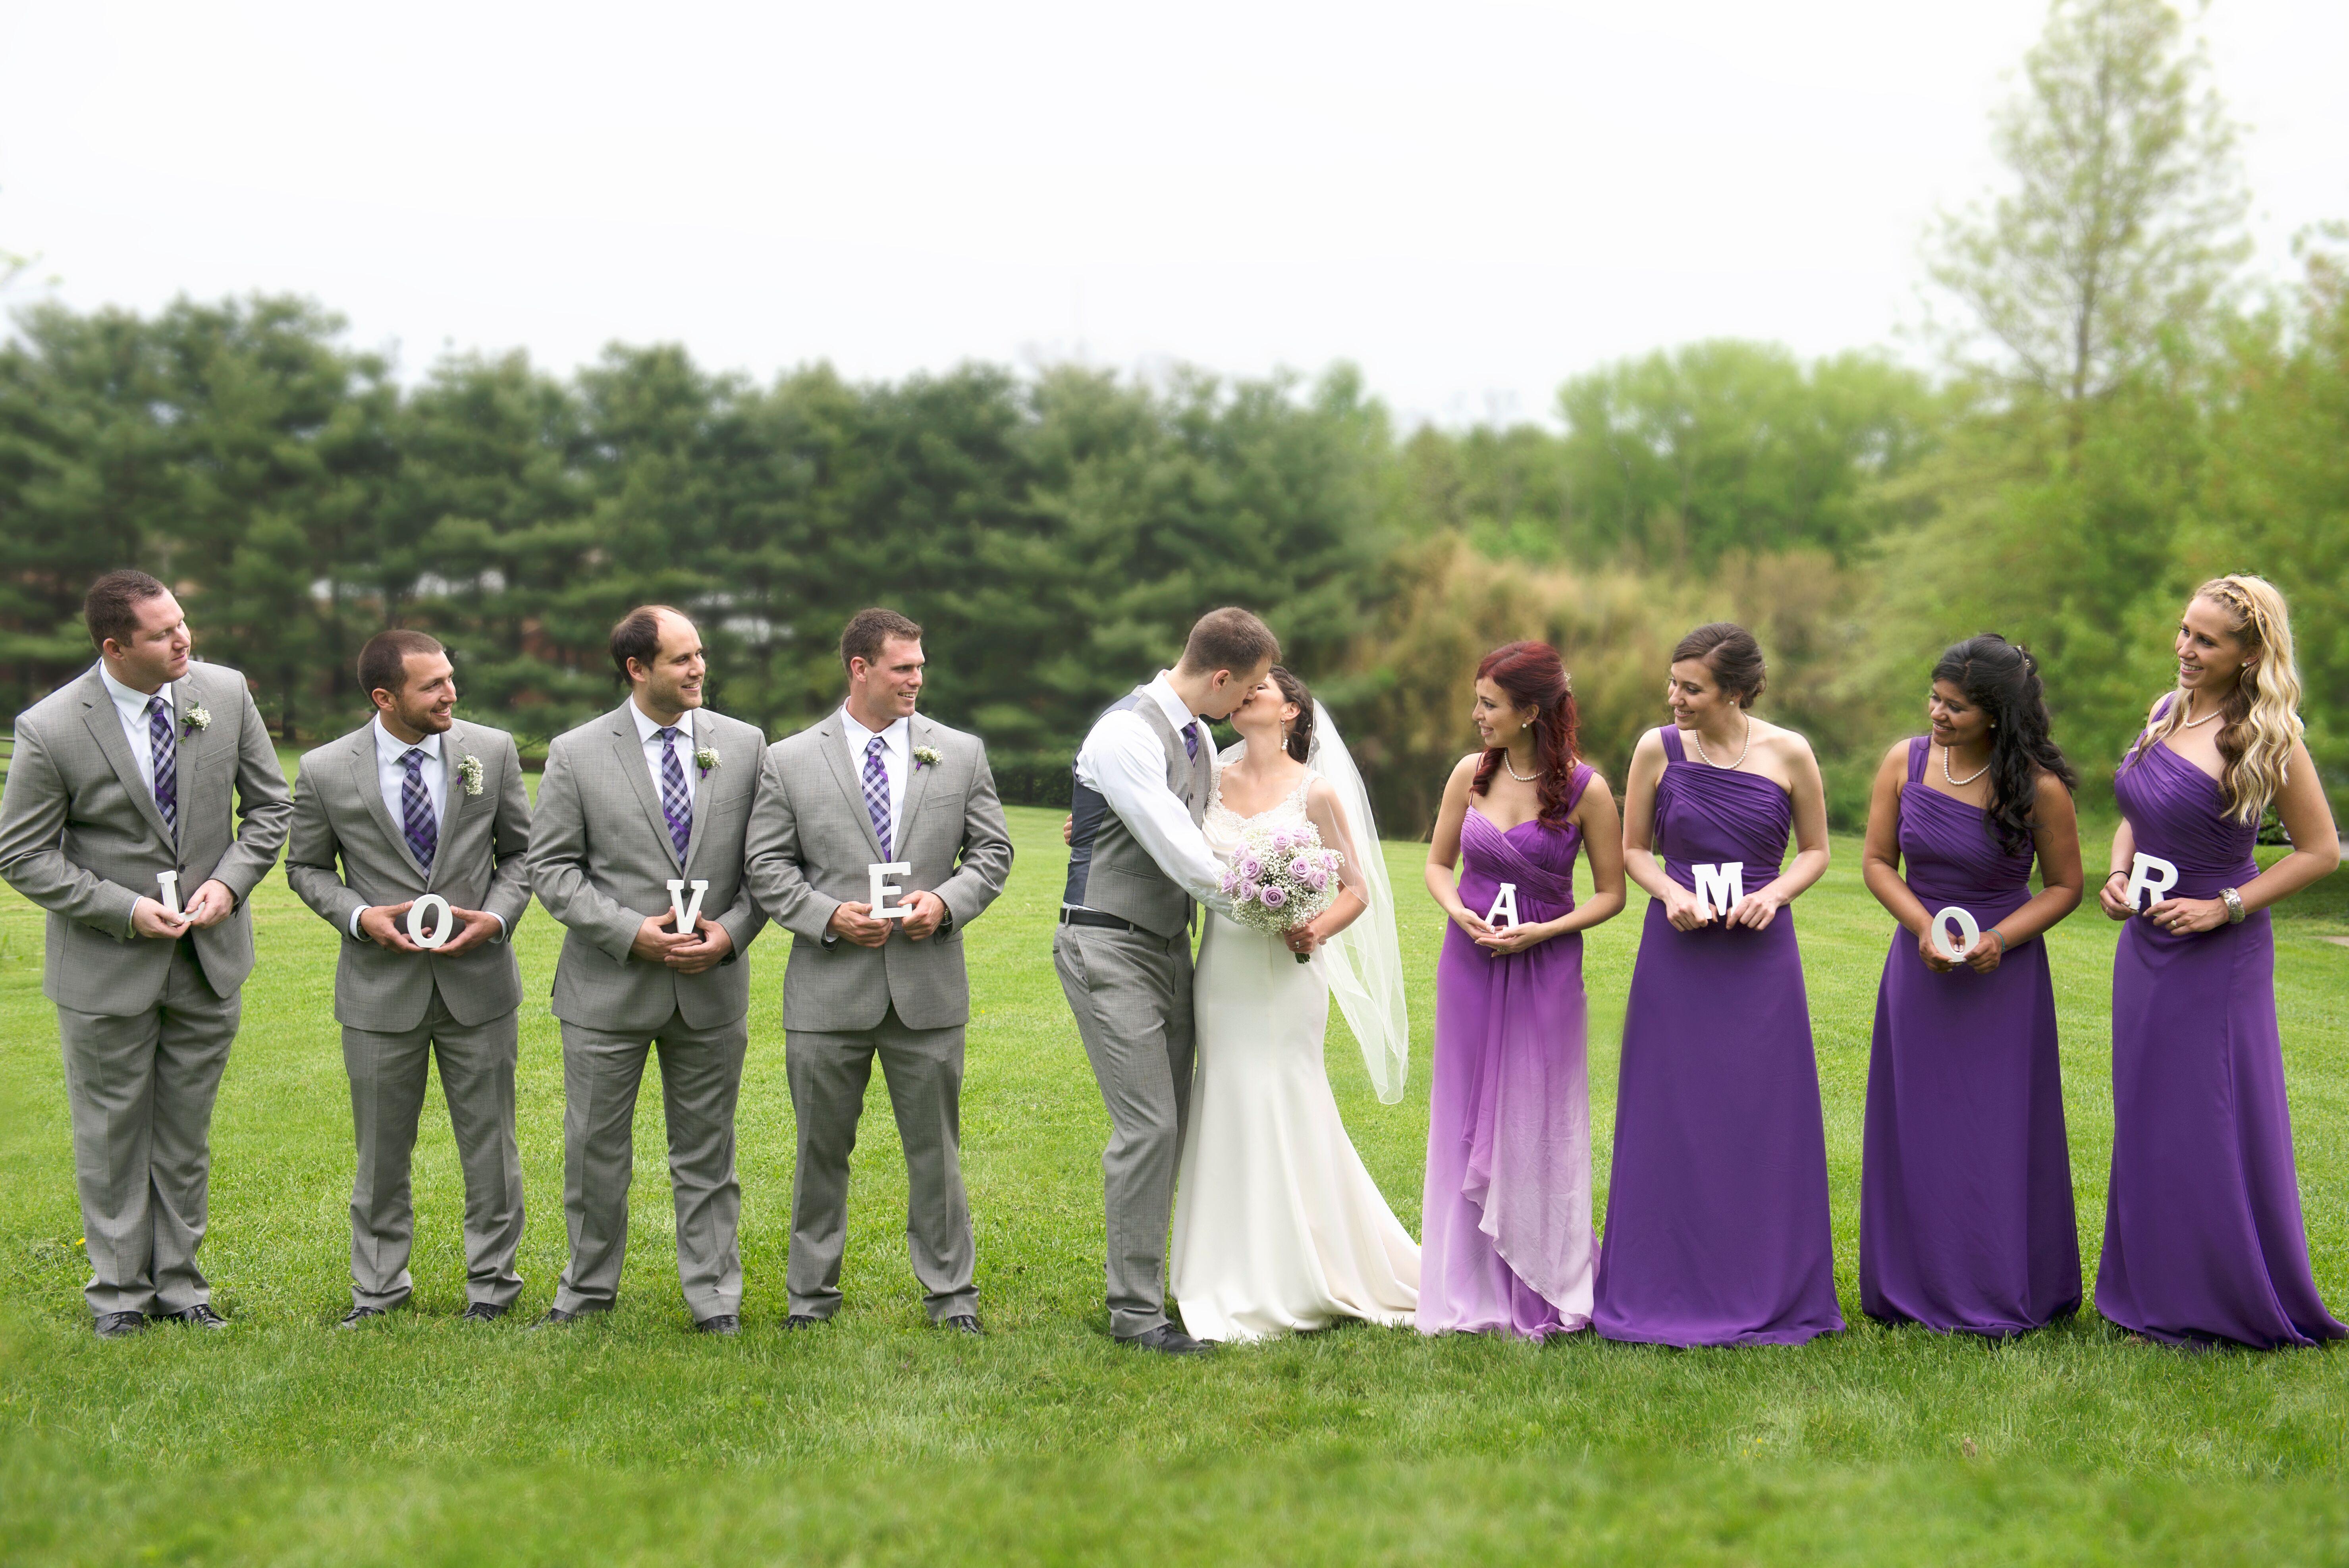 lilac bridesmaid and groom - HD5916×3949